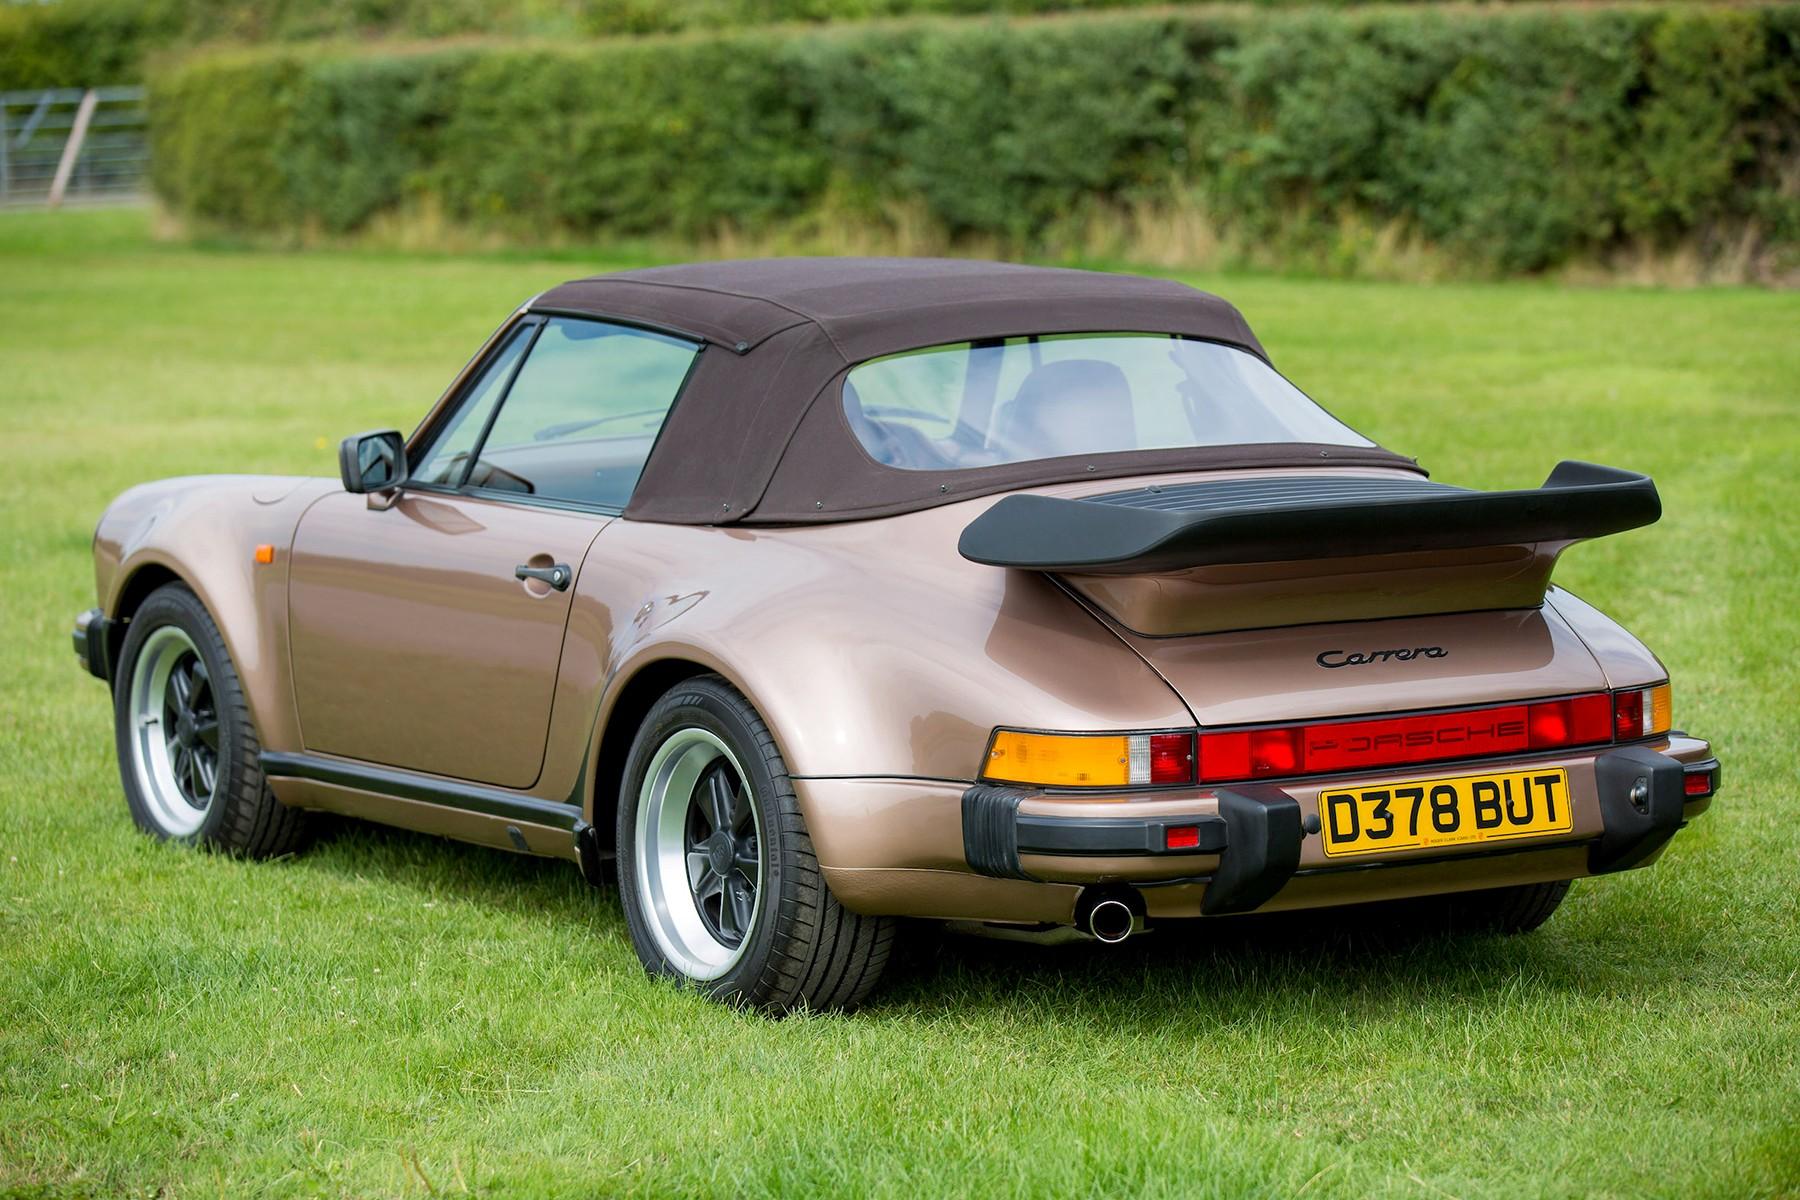 porsche 911 carrera cabriolet 930 specs 1983 1984 1985 1986 1987 1988 1989 autoevolution. Black Bedroom Furniture Sets. Home Design Ideas